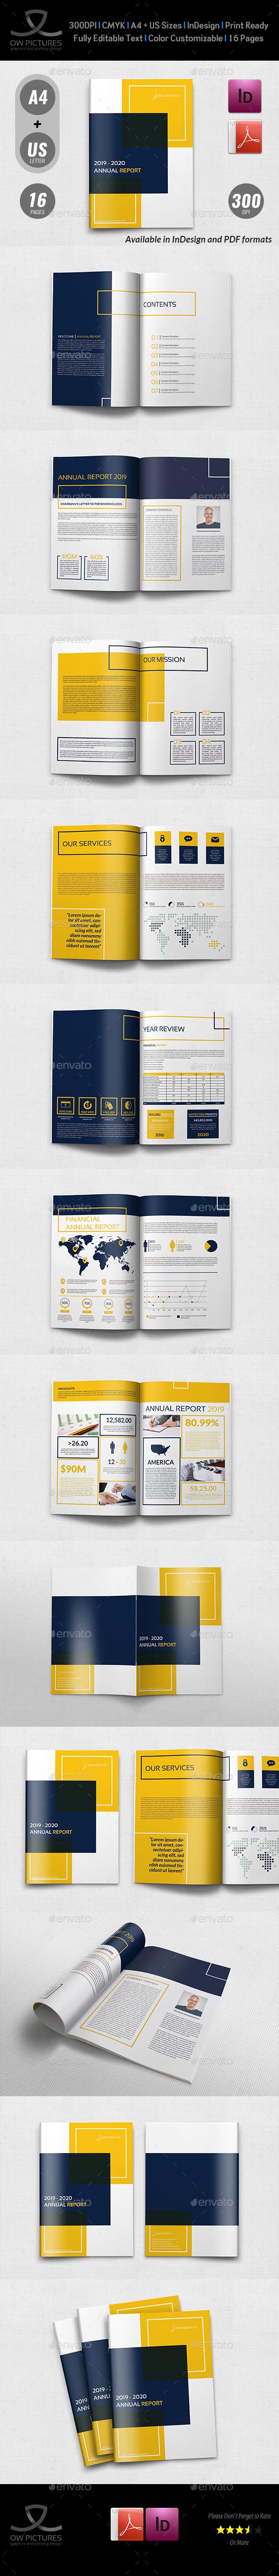 Annual Report Brochure Template Vol.2 - Brochures Print Templates